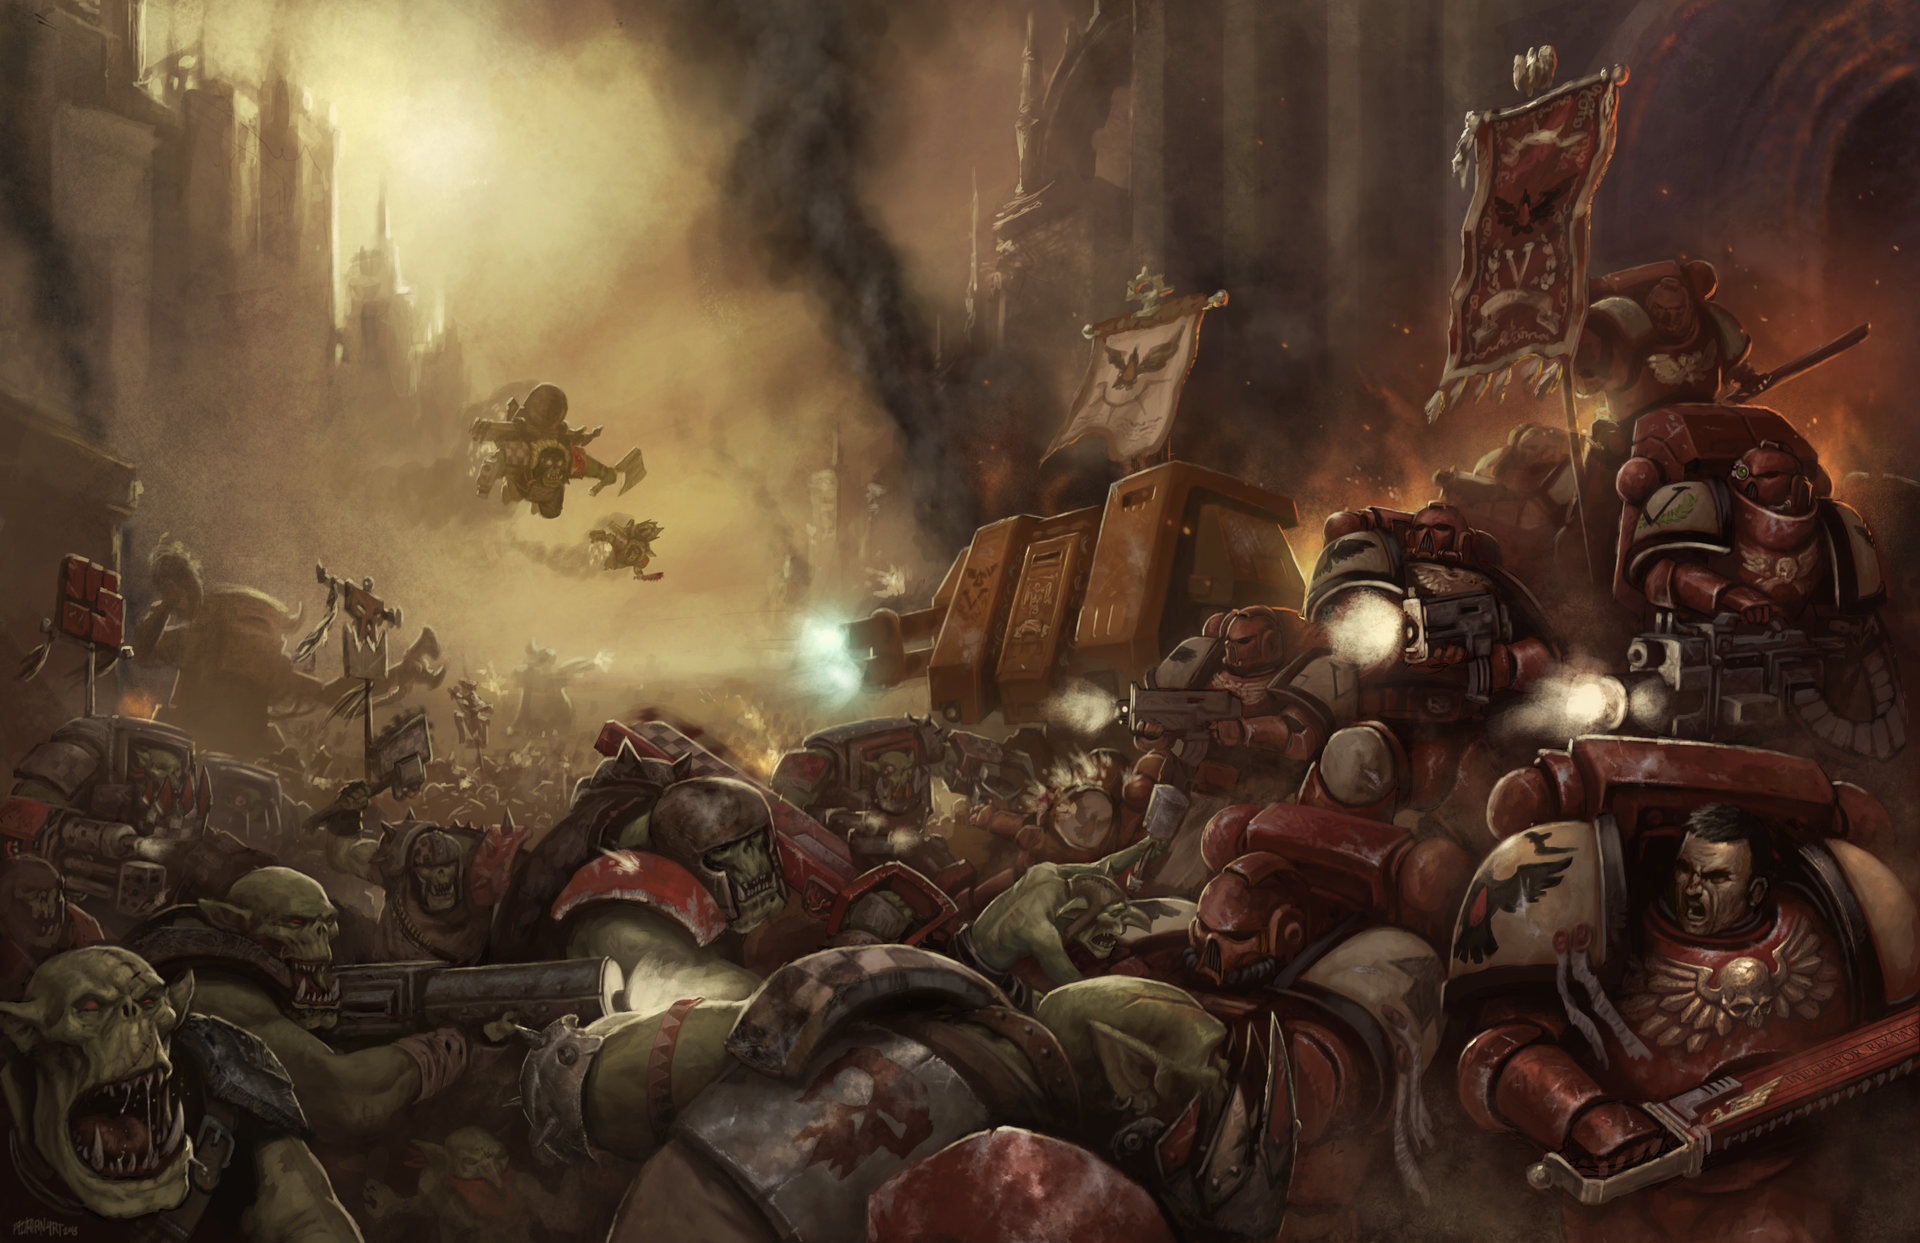 warhammer art.jpg